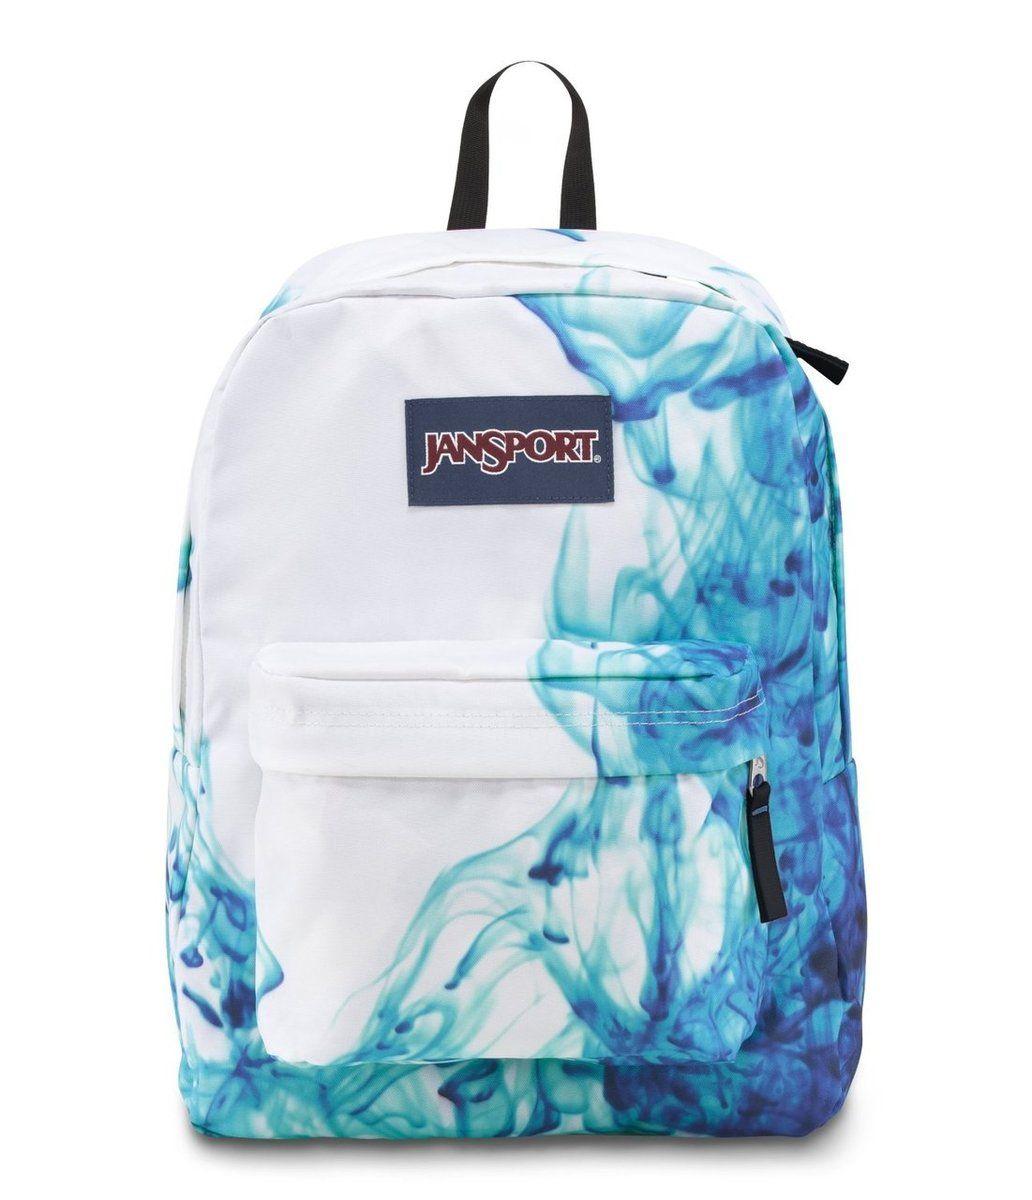 JANSPORT SUPERBREAK BACKPACK SCHOOL BAG - Multi/Blue Drip Dye ...